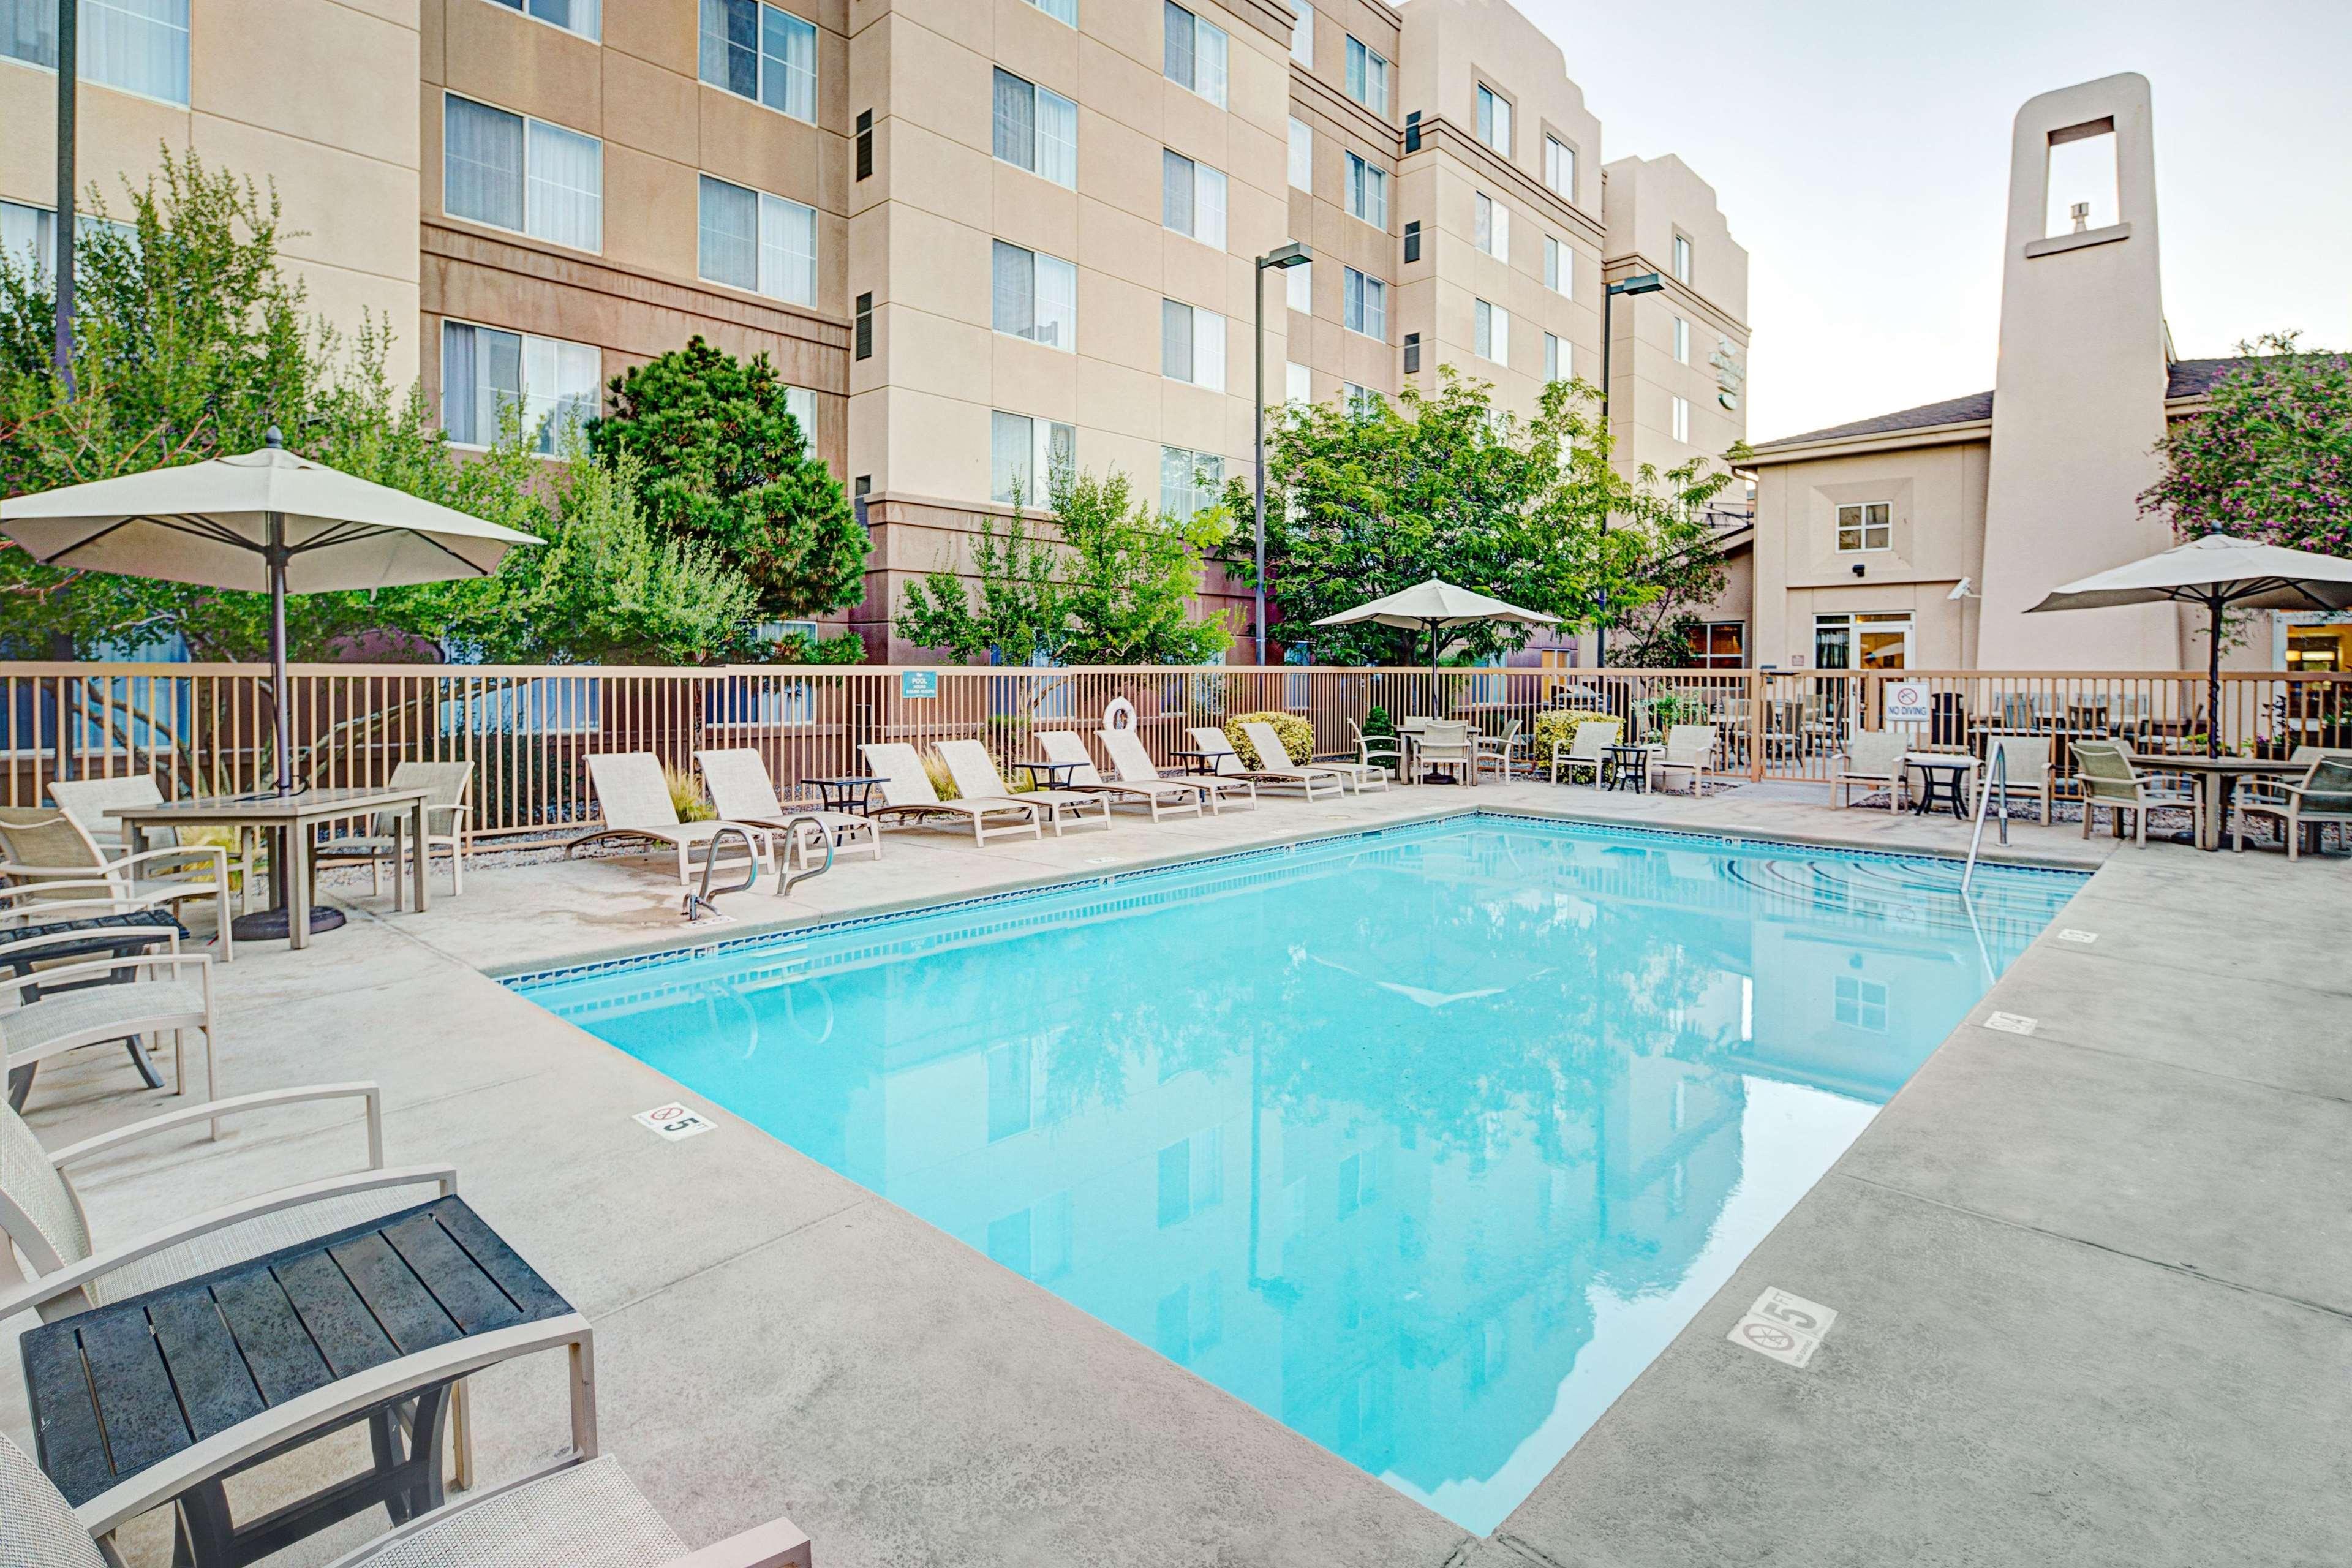 Hilton Garden Inn Albuquerque Uptown NM Hotels inducedinfo